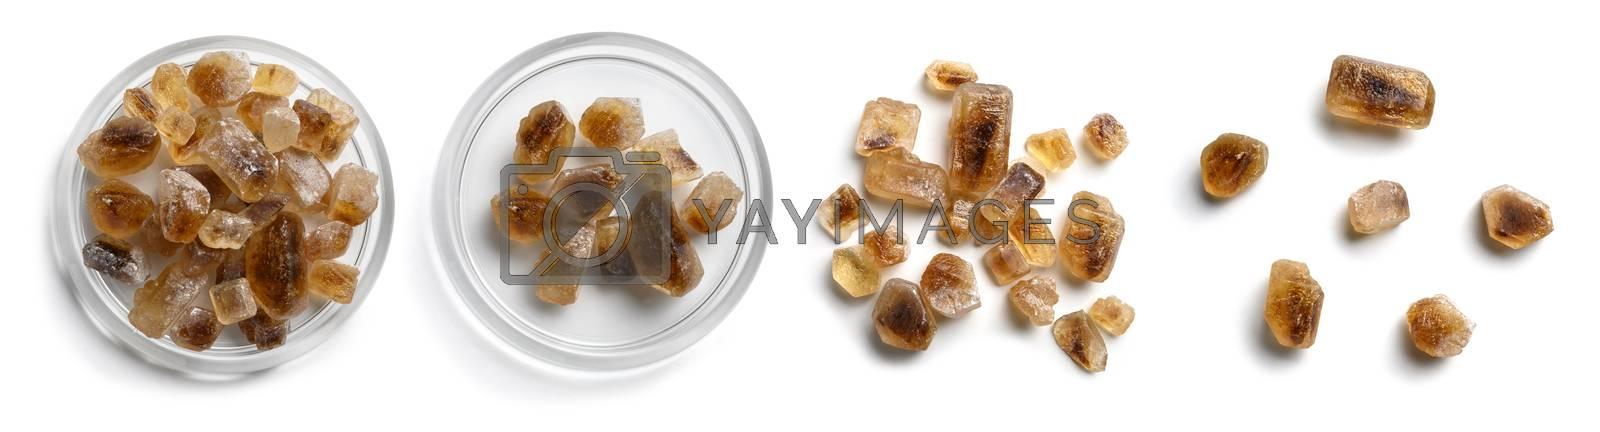 Set of caramel sugar on a white background.